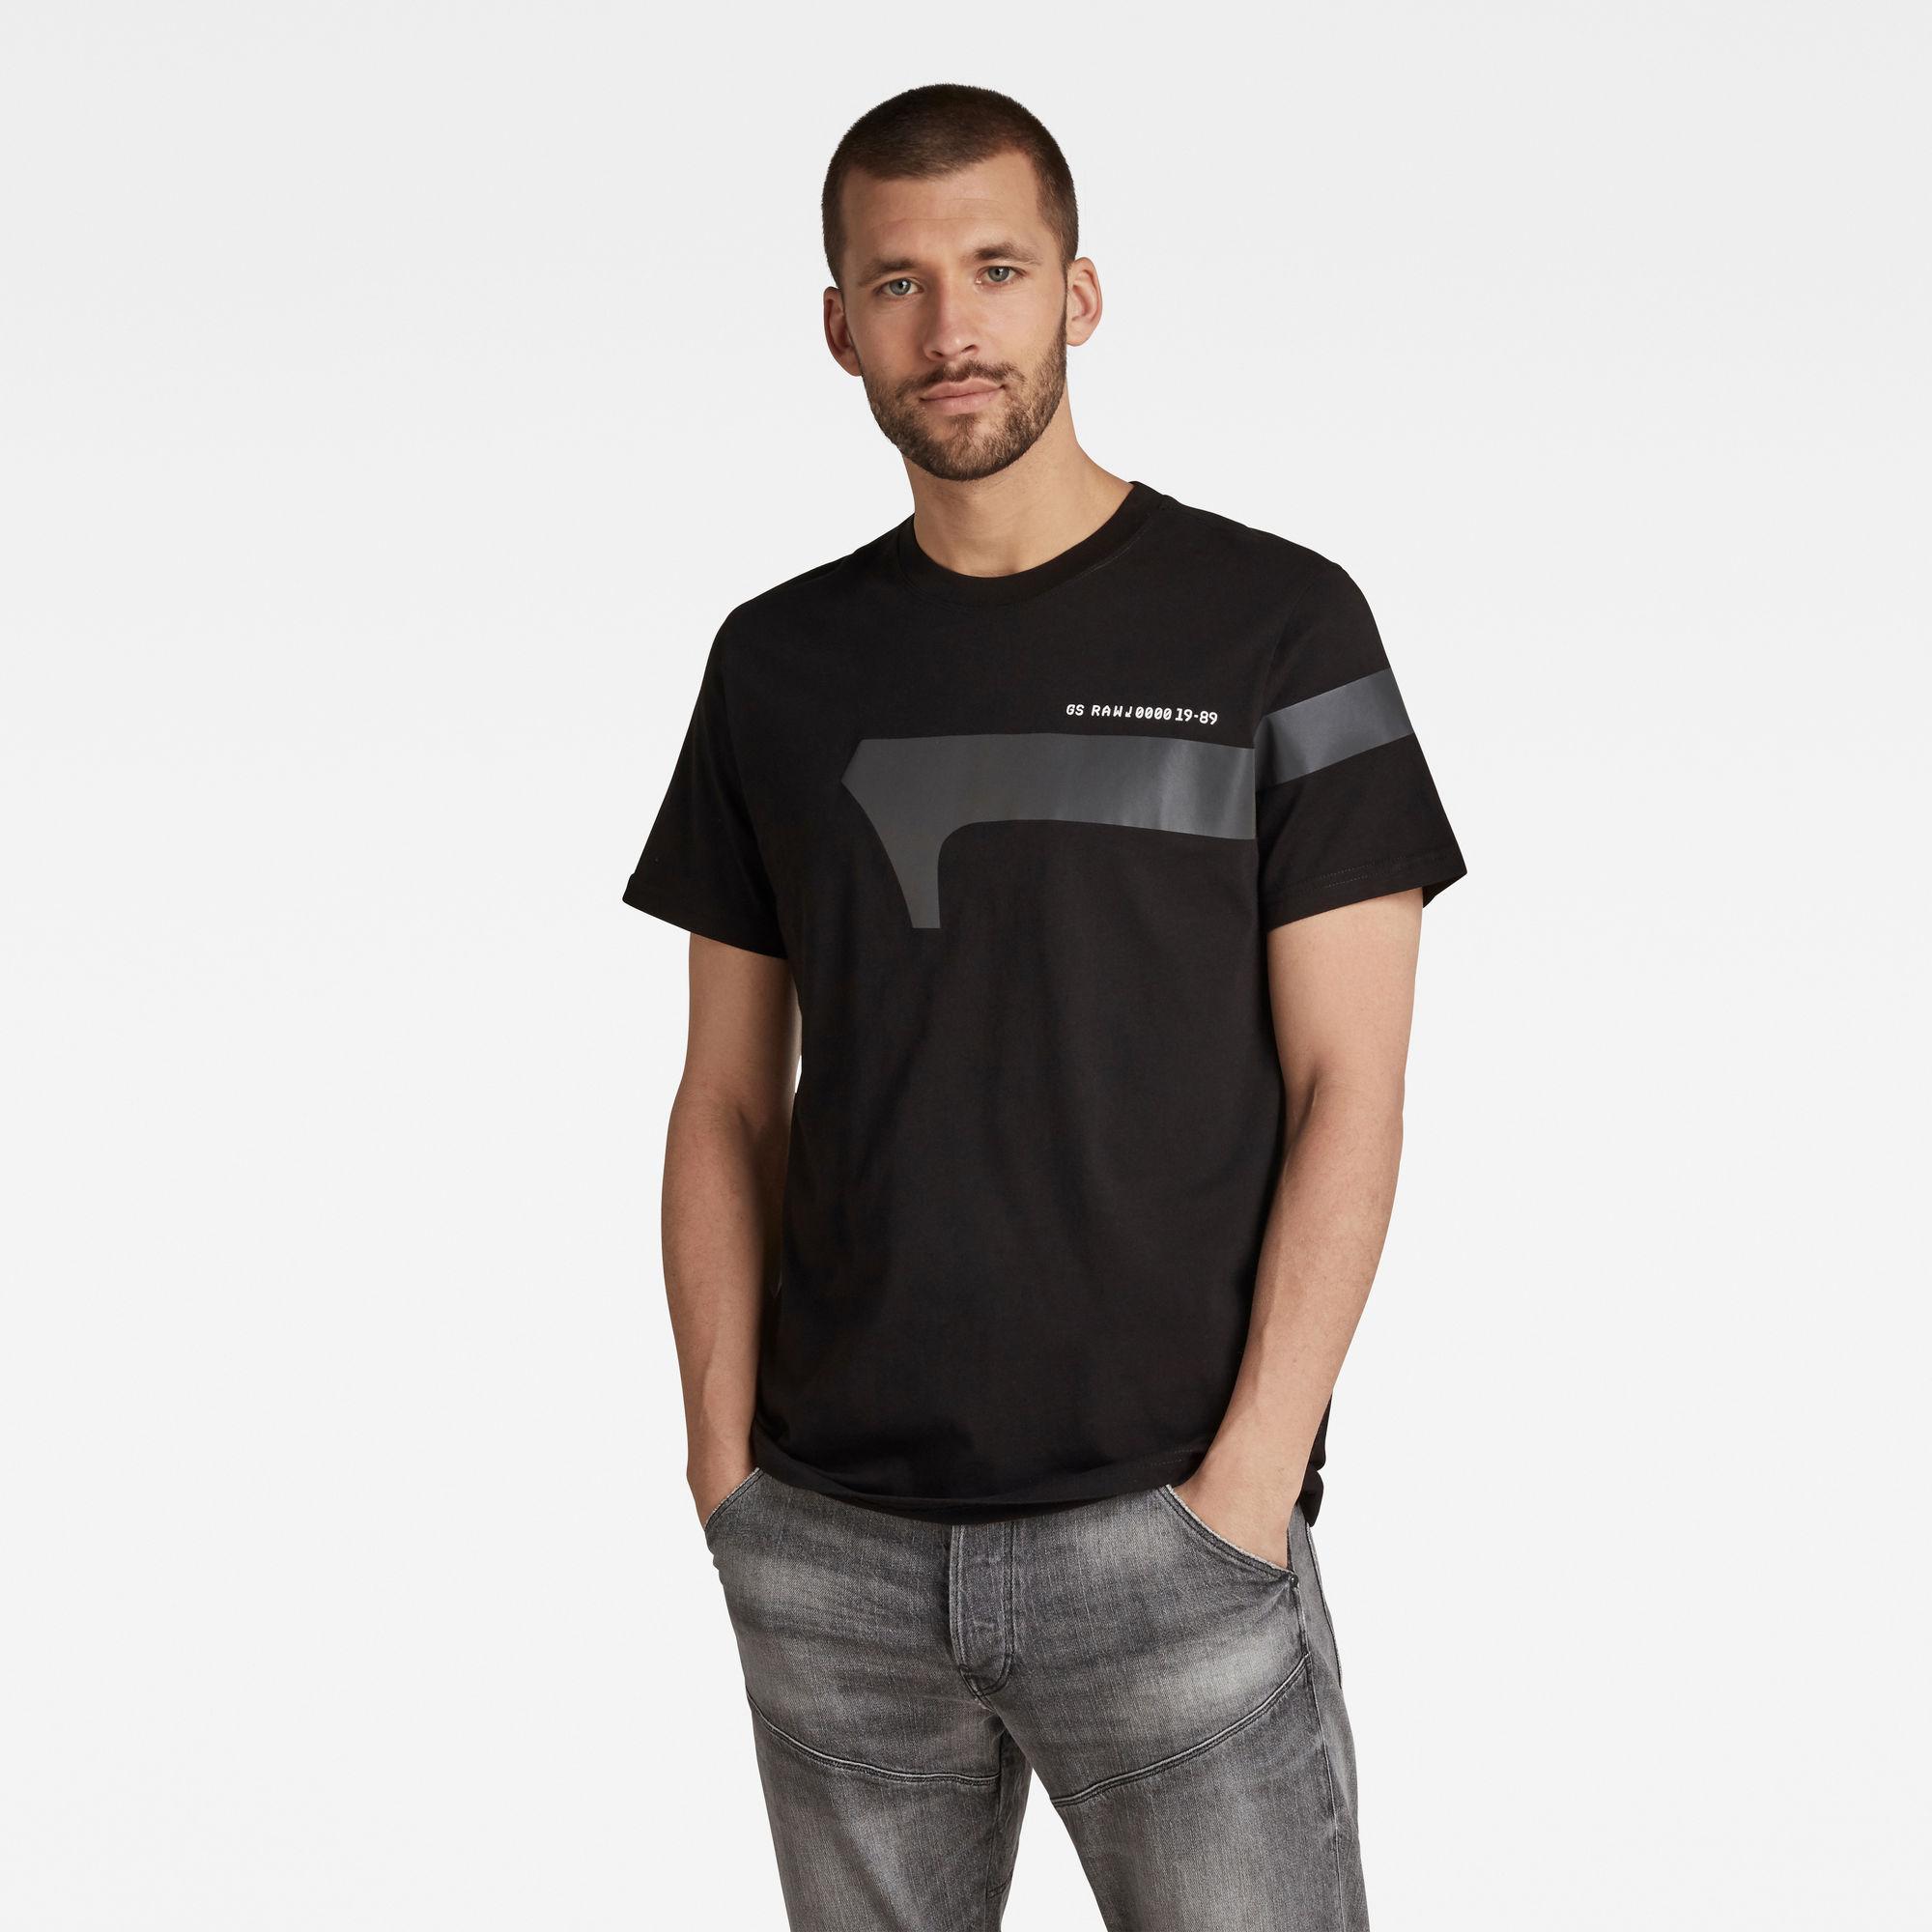 G-Star RAW Heren 1 Reflective Graphic T-Shirt Zwart